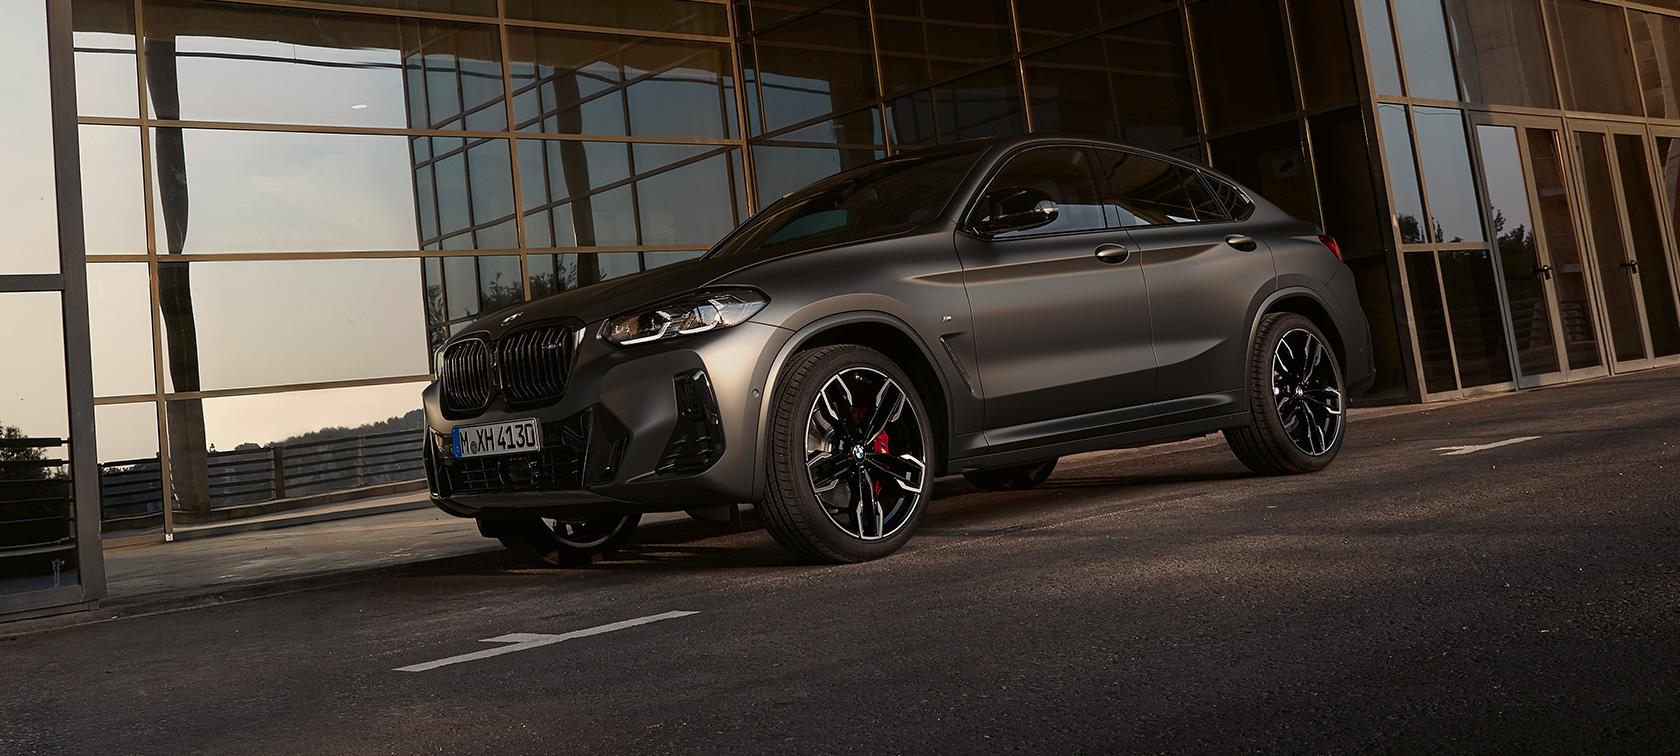 BMW X4 M Design Exterior